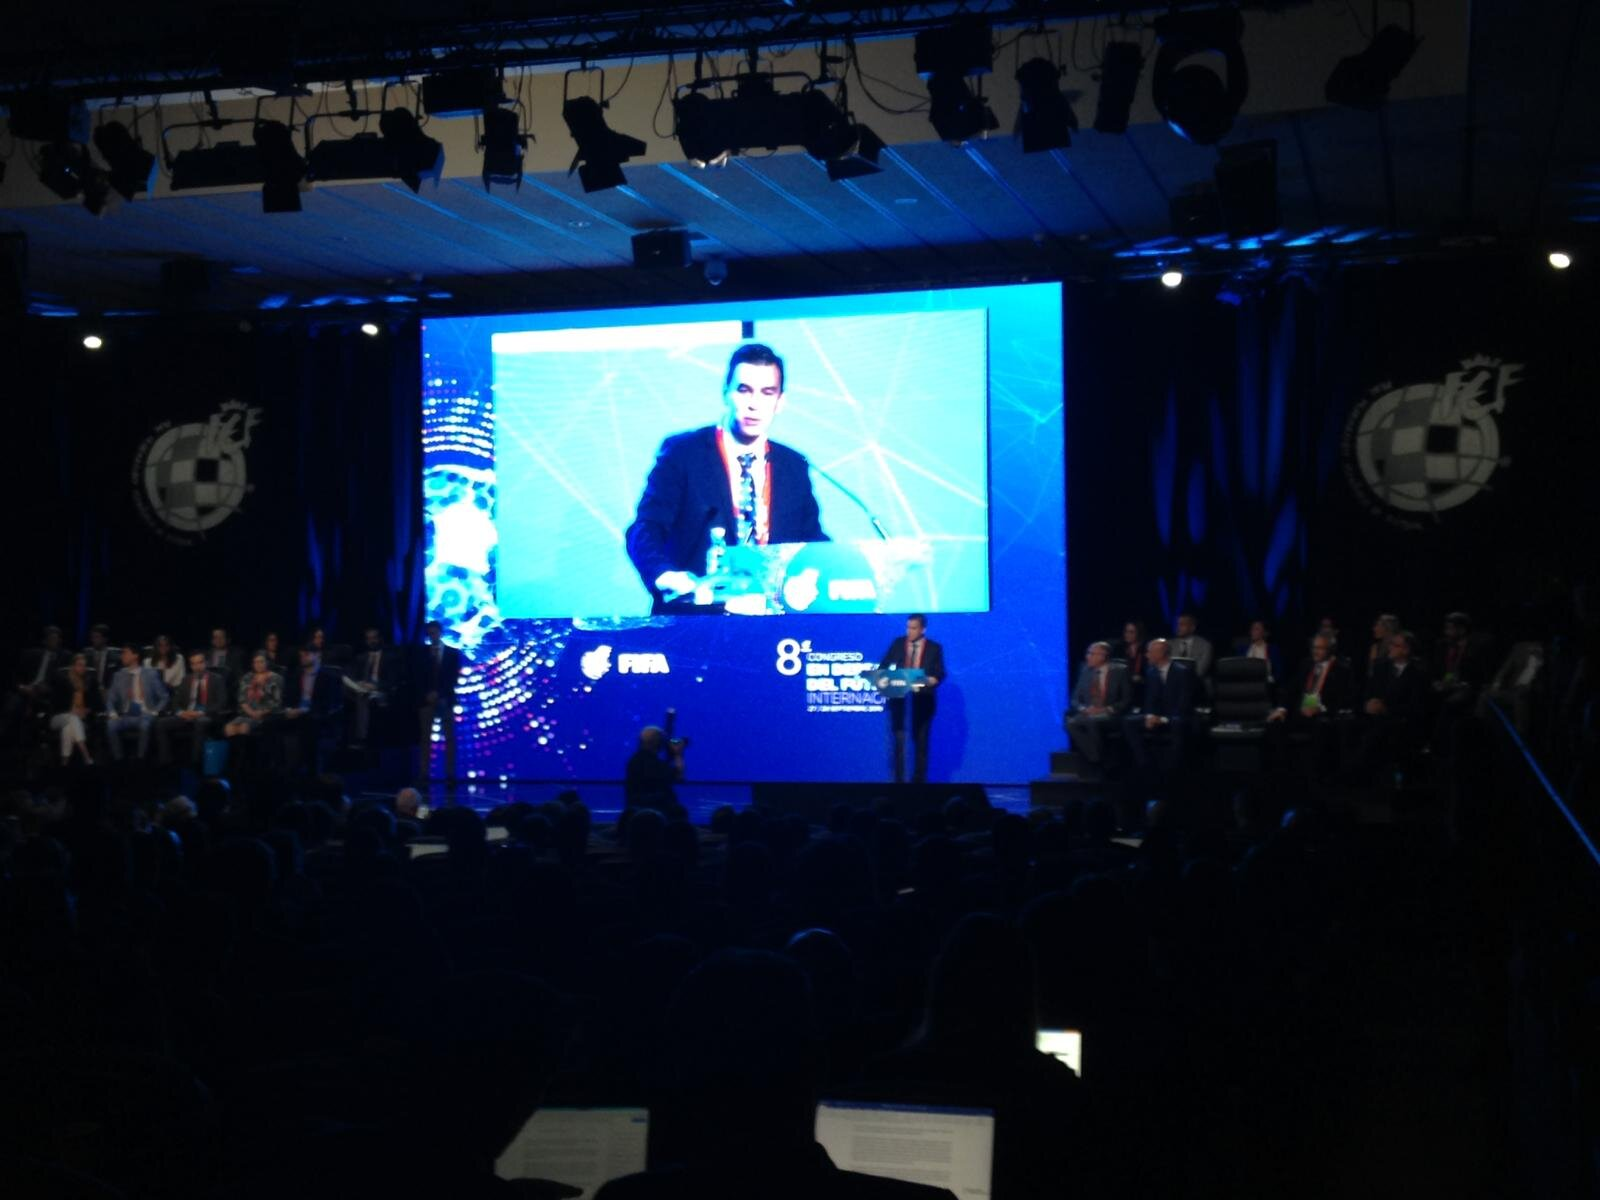 Emilio Garcia Silvero, FIFA's Chief Legal Officer